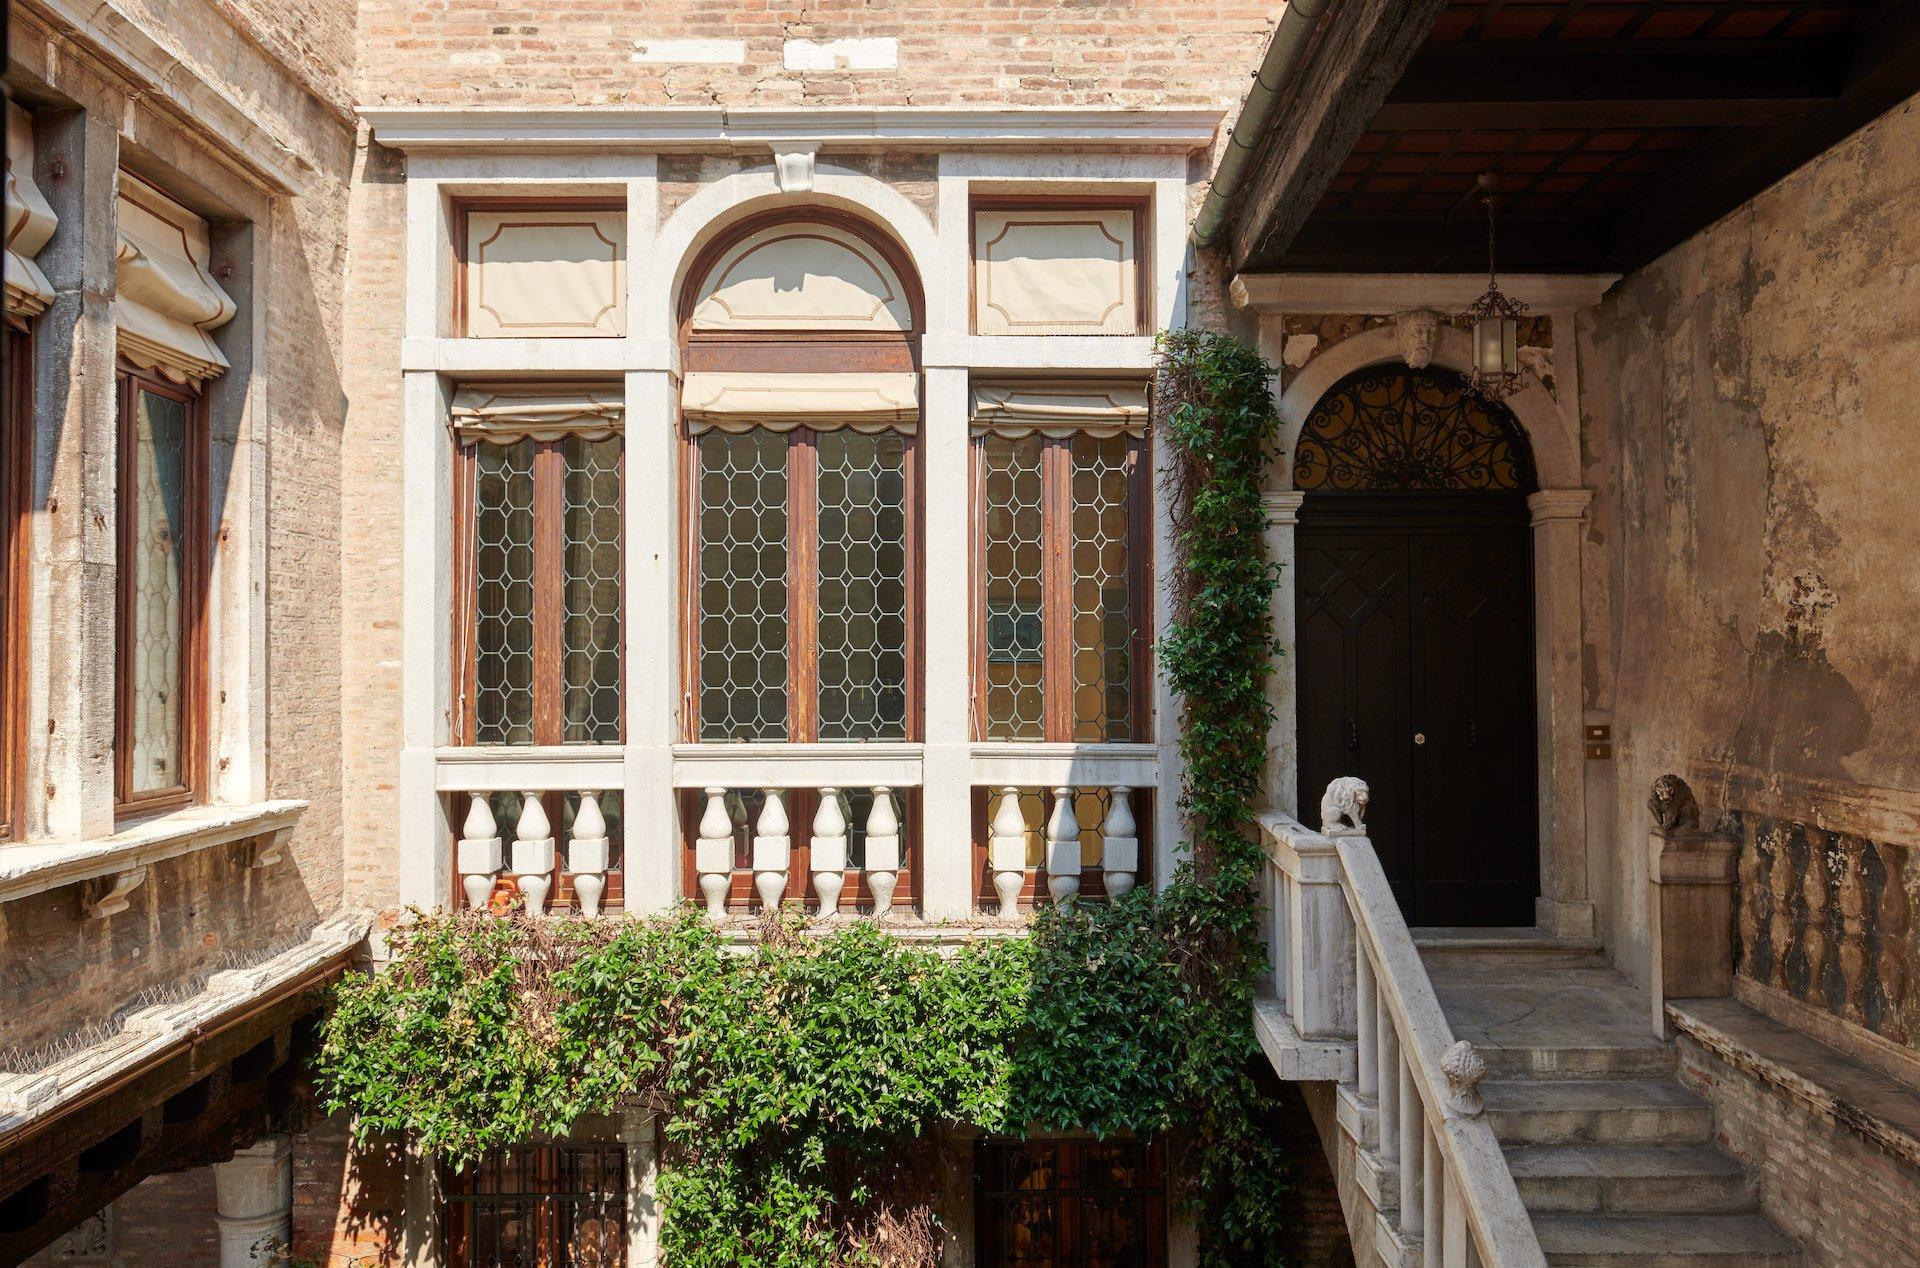 Byzantine Palazzetto With Private Bridge Courtyard In Venice